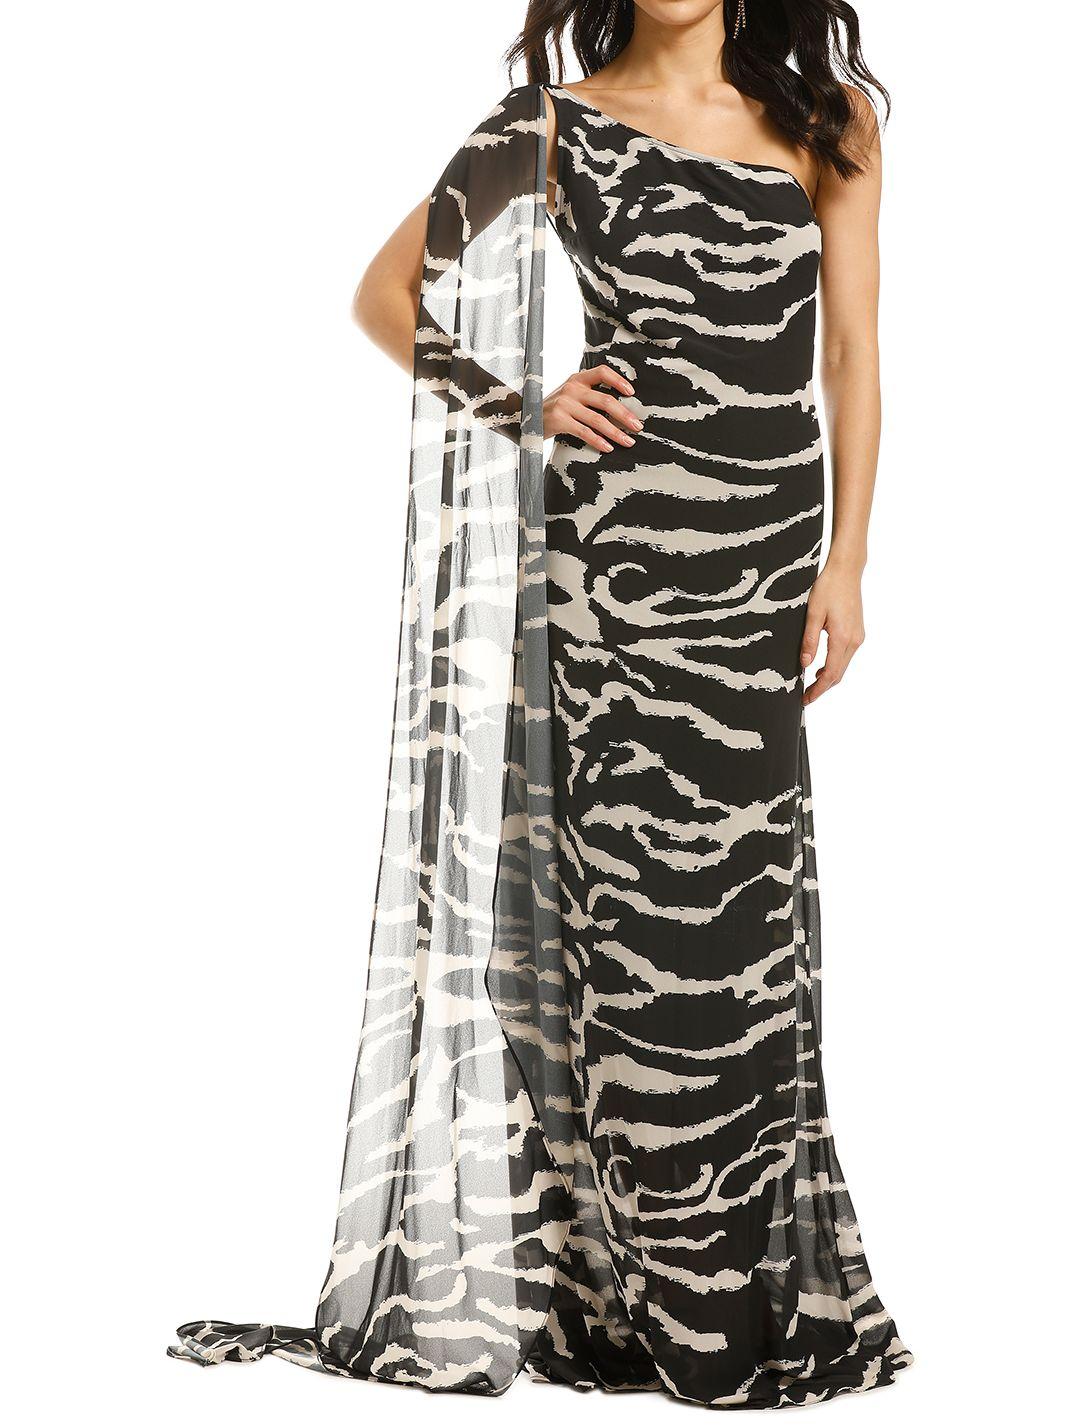 Lexi-Zola-Dress-Black-Ivory-Front